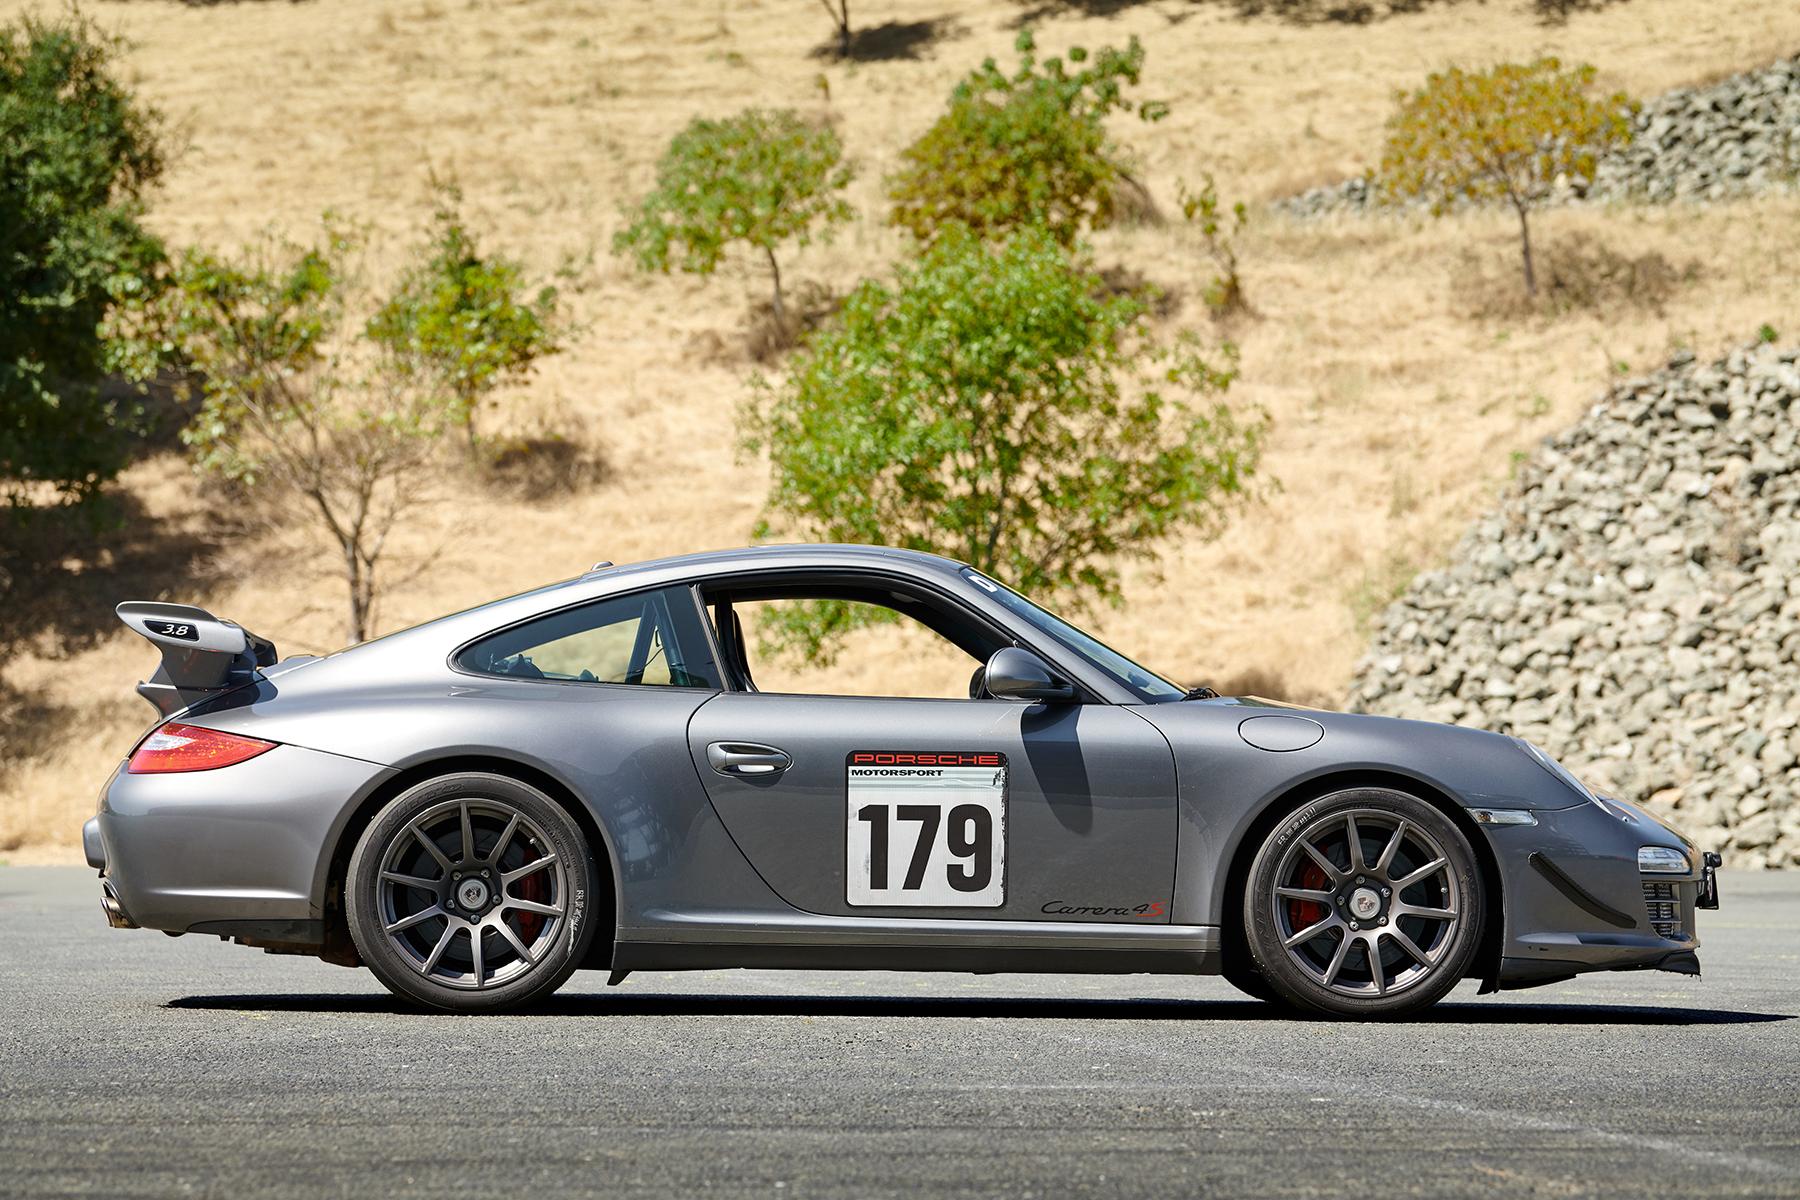 Porsche 997.2 Carrera 4S with APEX SM-10 Wheels